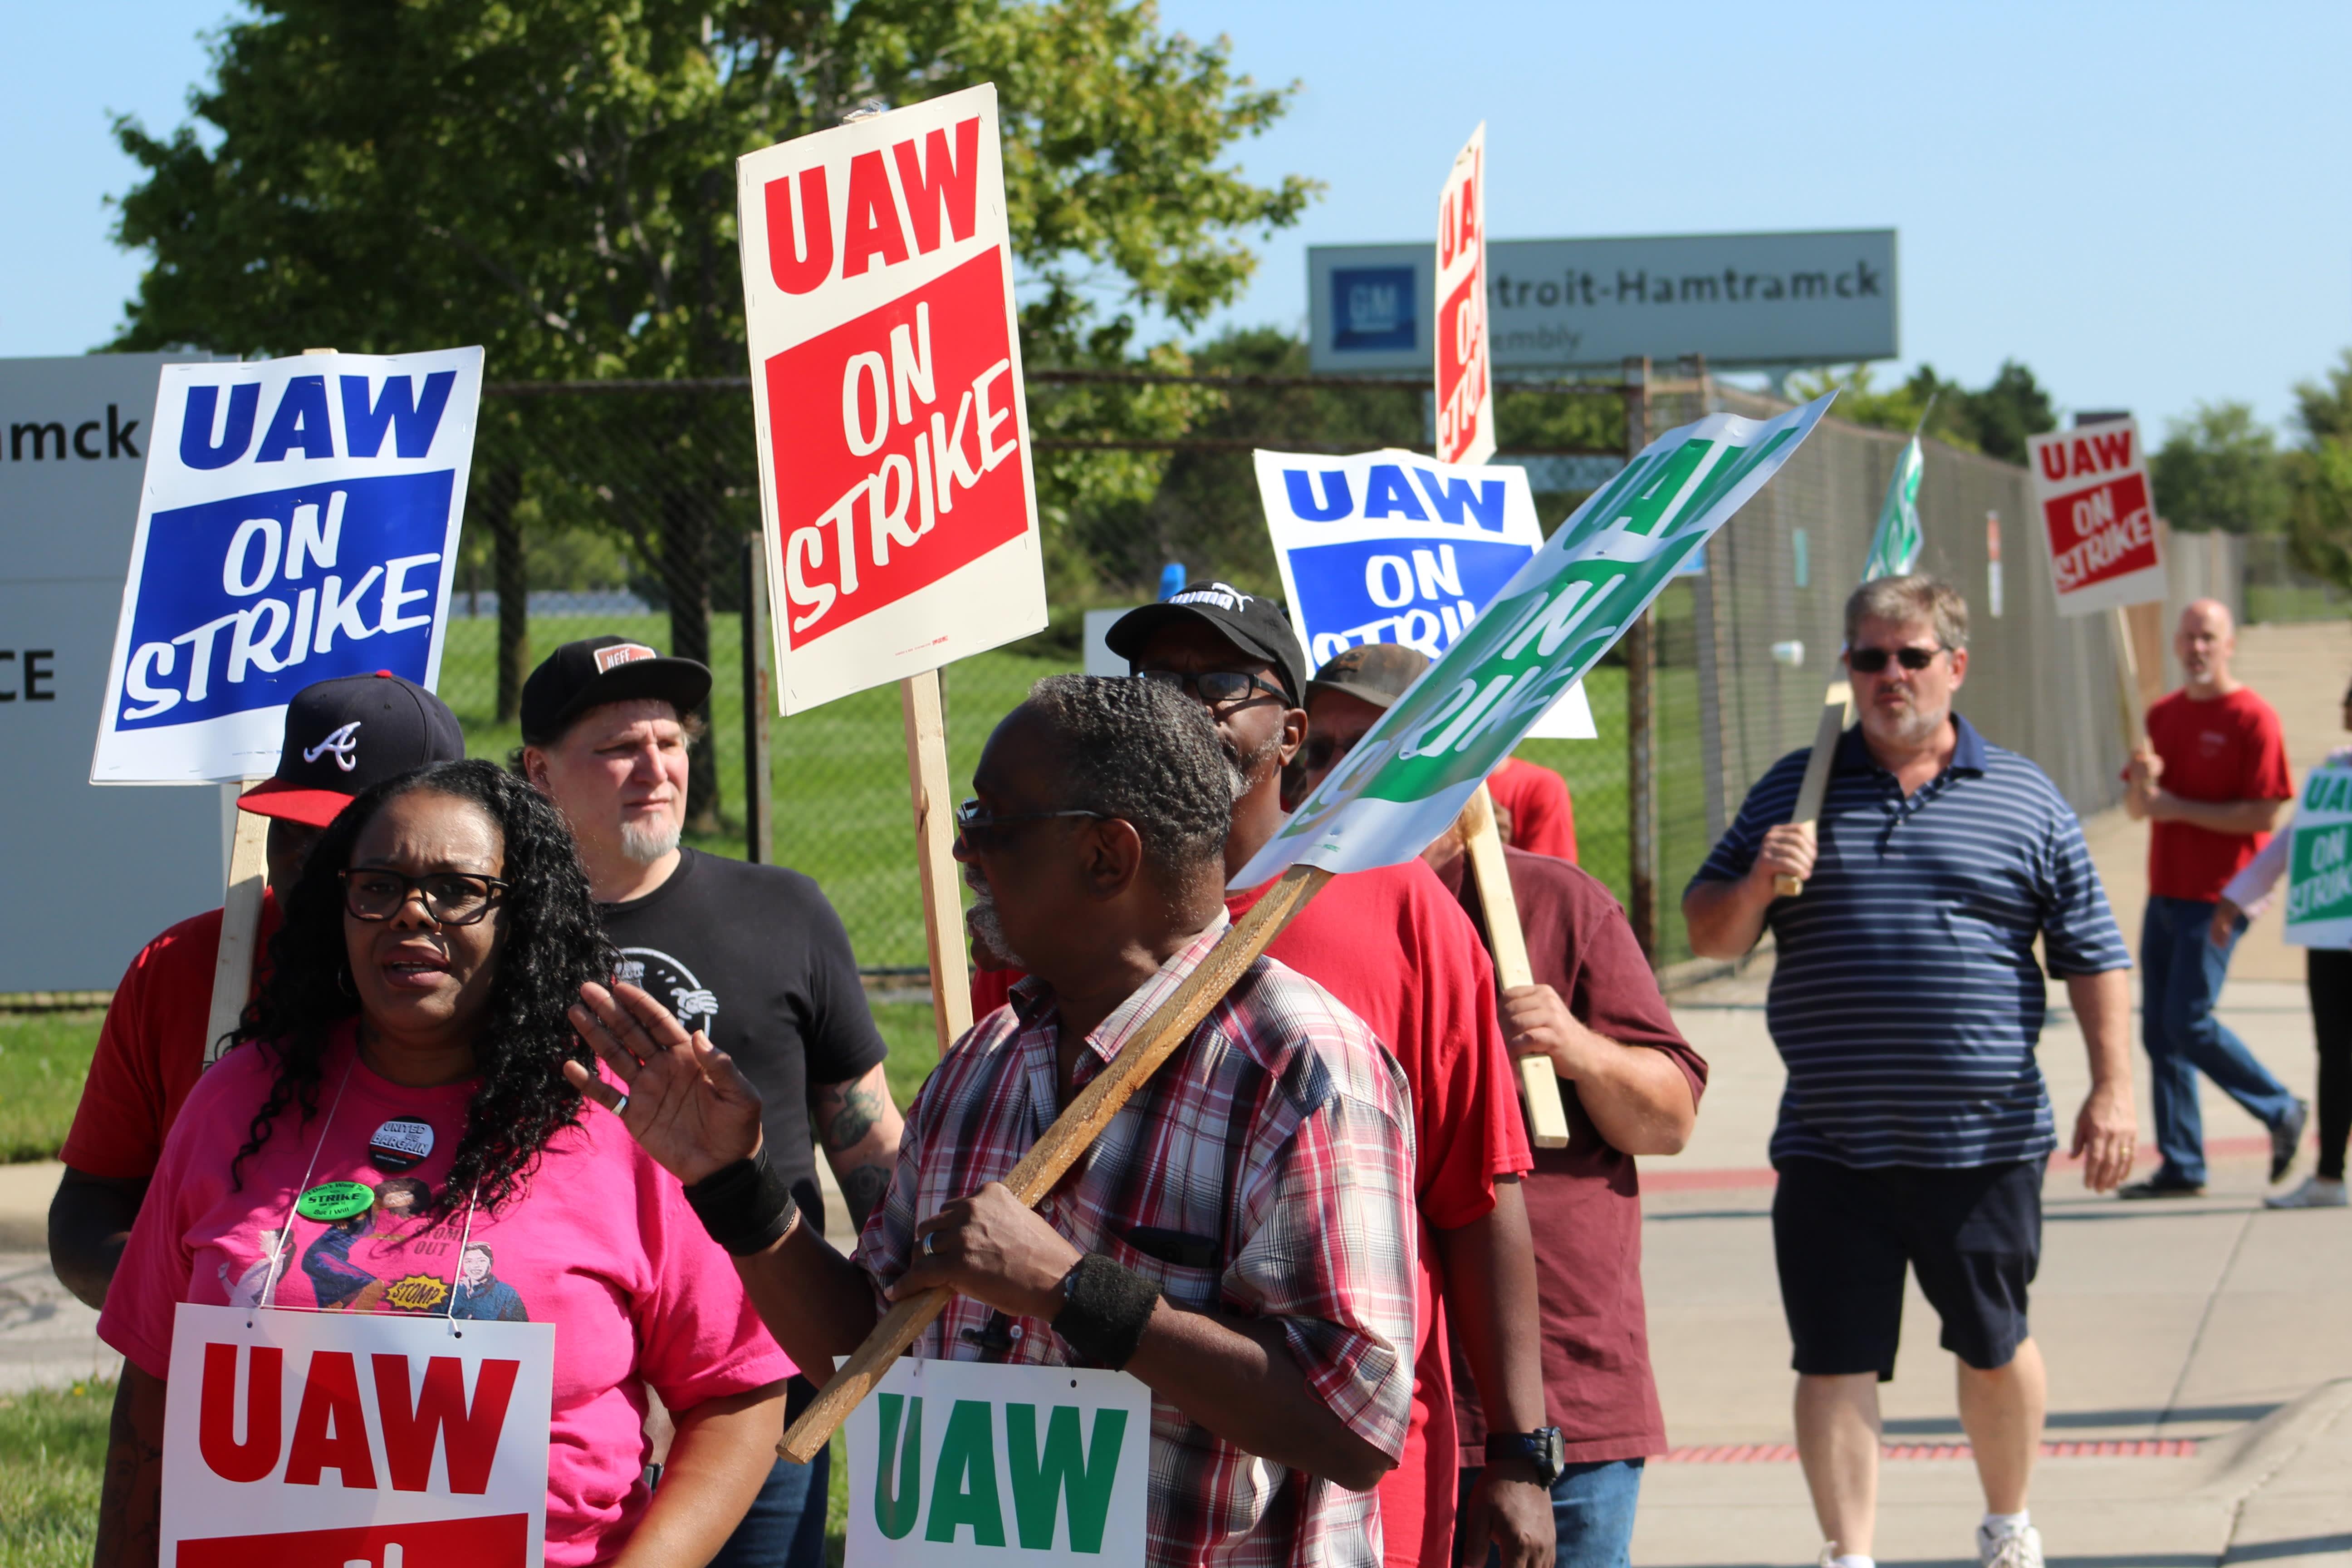 Auto workers strike has cost GM over $1 billion, JP Morgan estimates